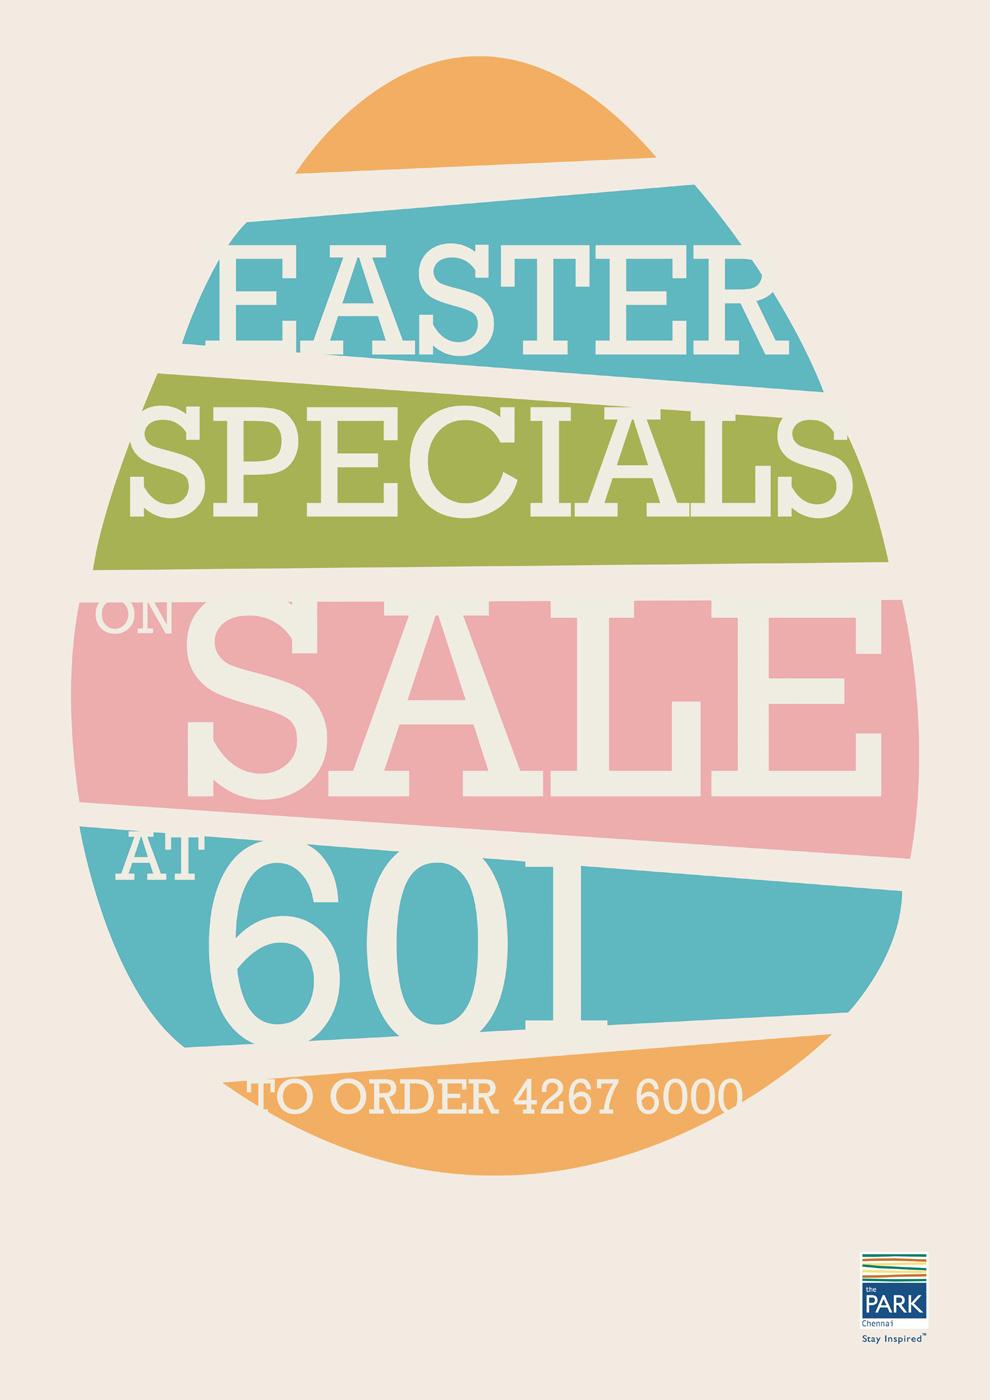 Easter Email Design: Push the boundaries! APSIS Blog